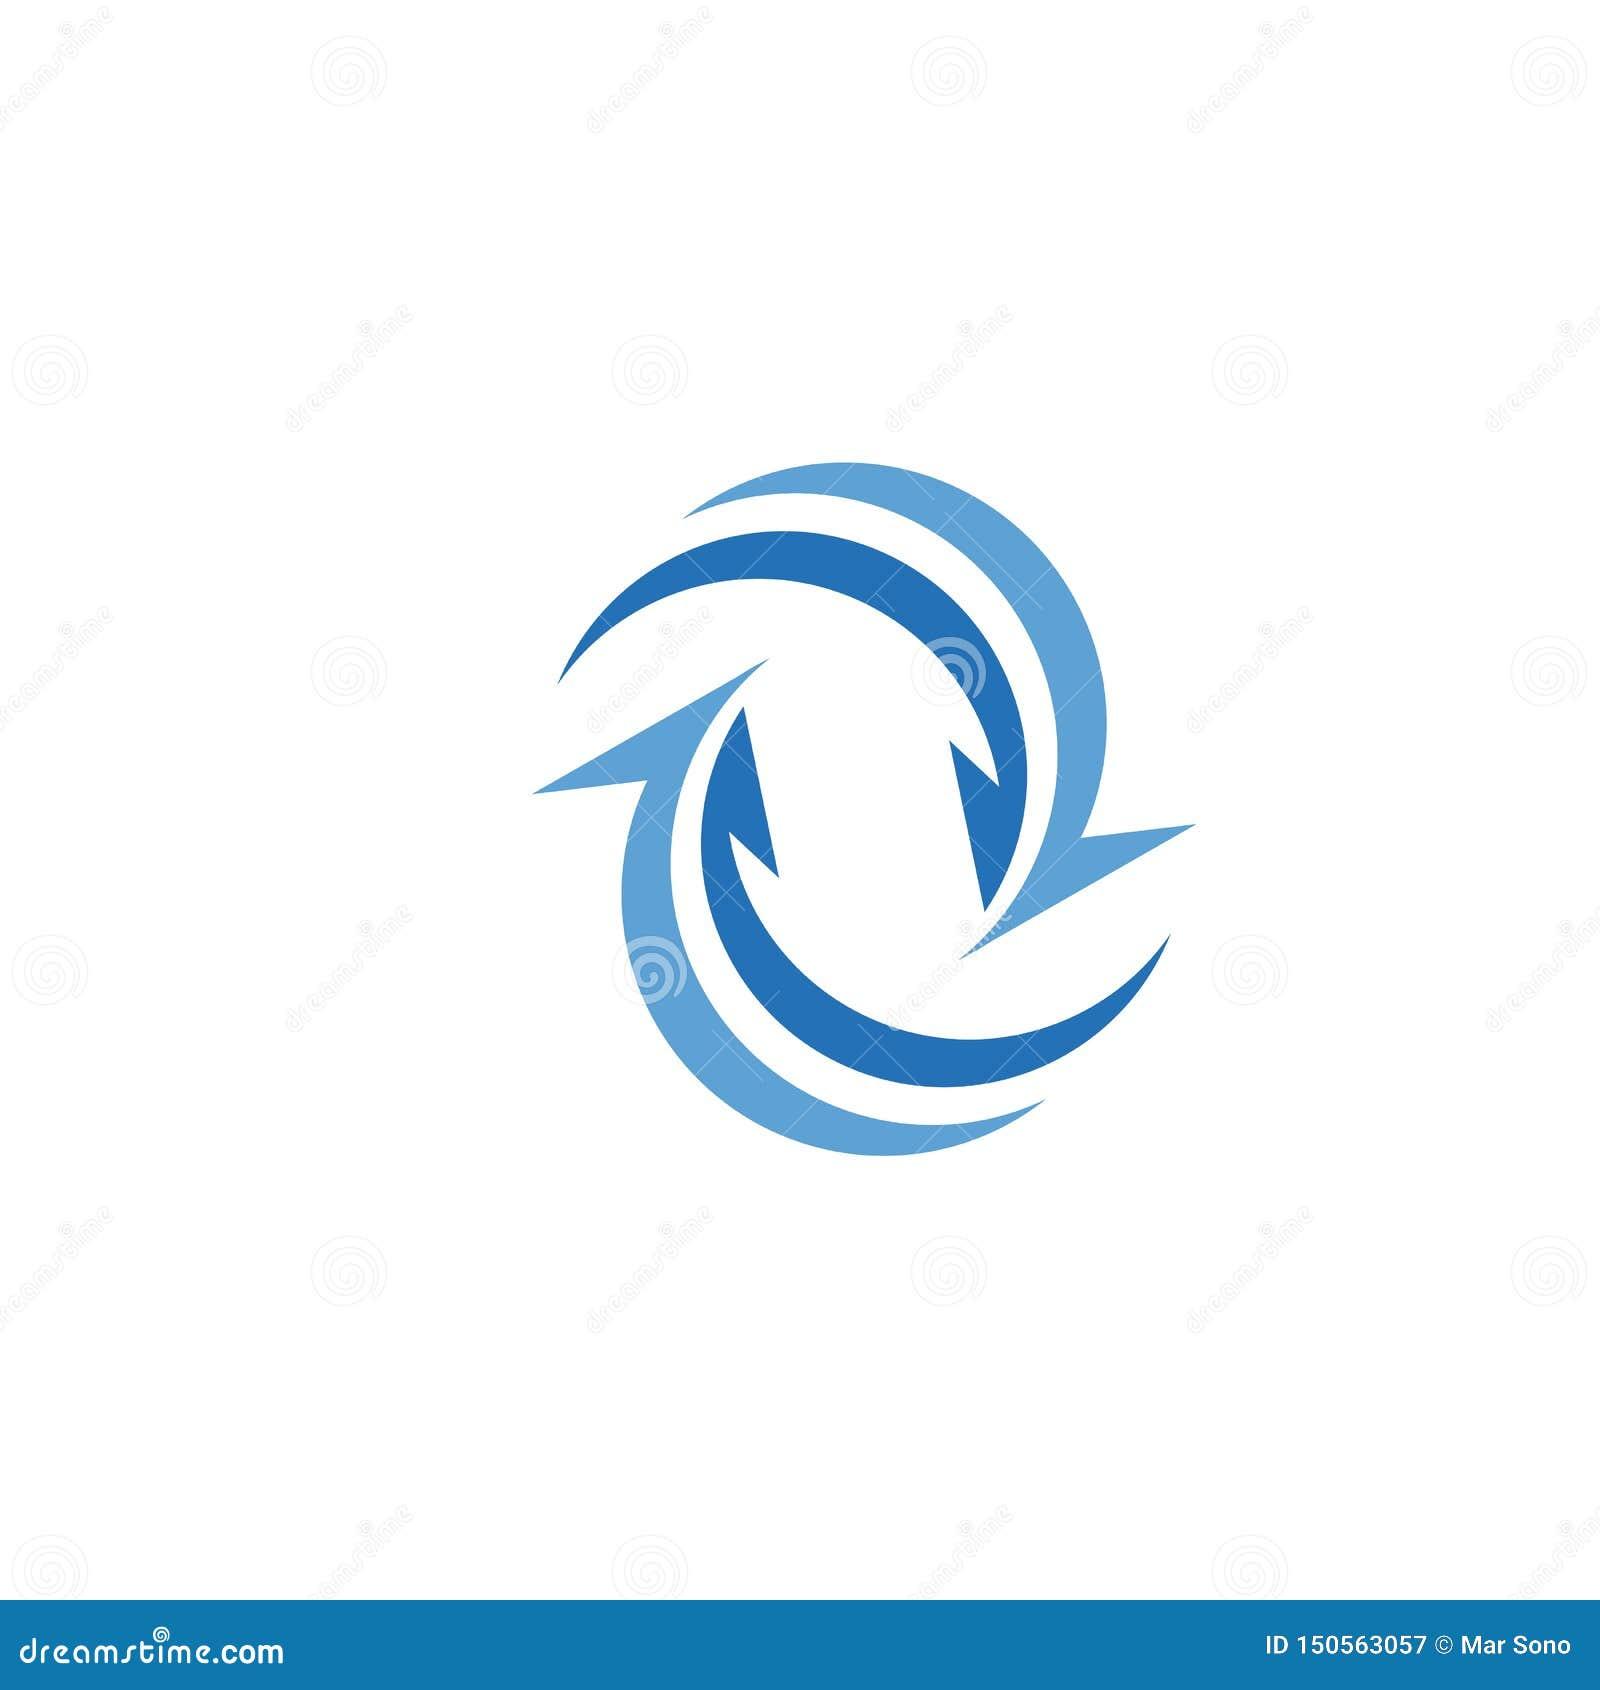 Arrow vector illustration icon